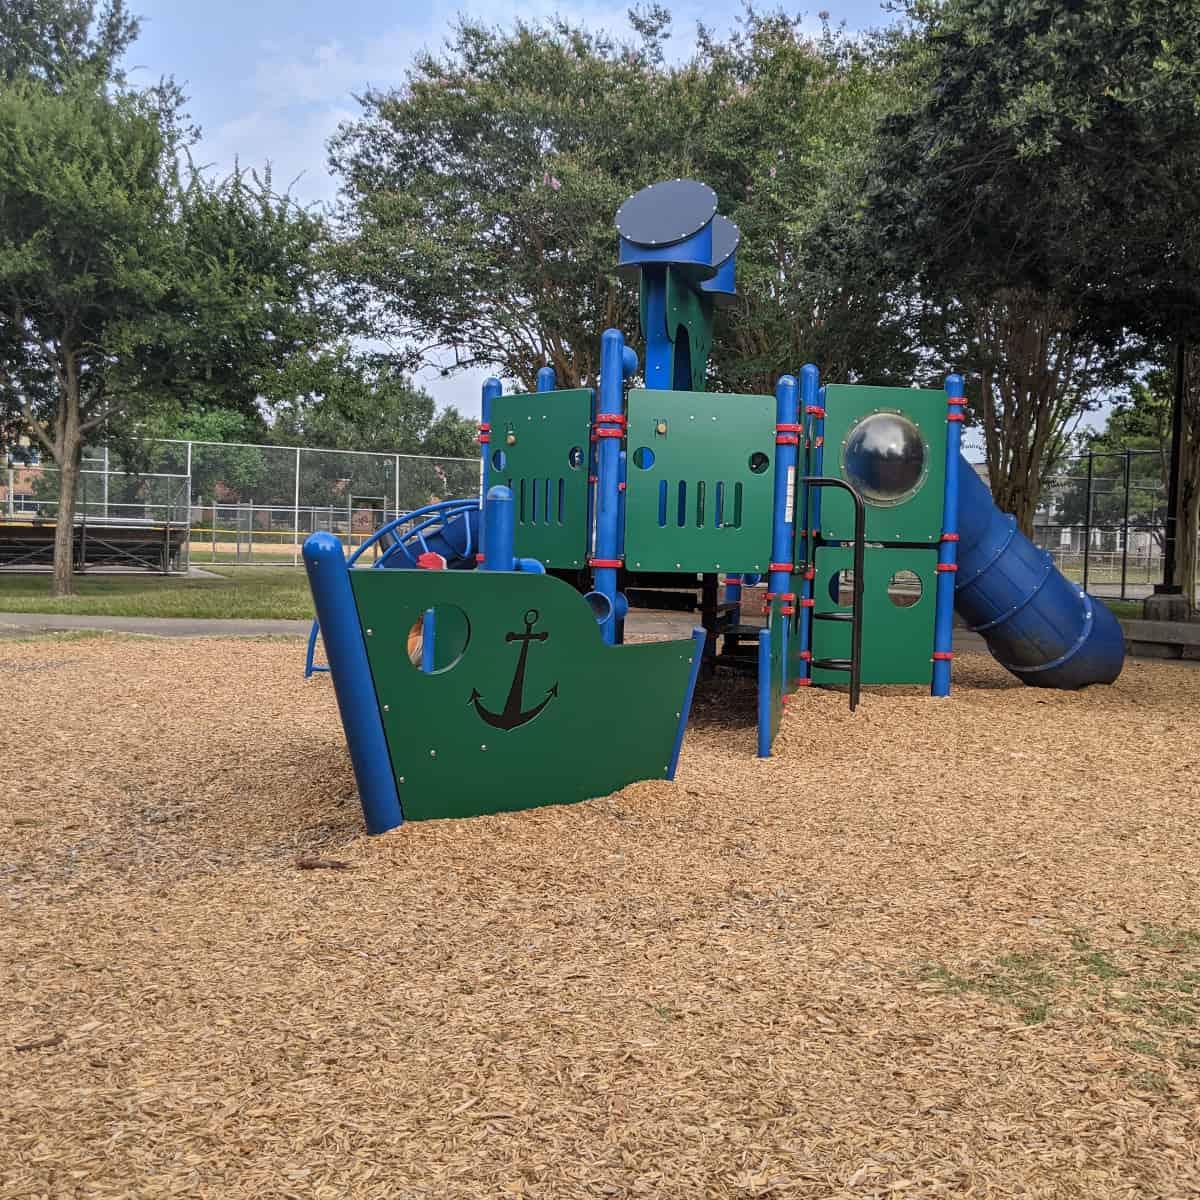 Ship Playground at Meyerland Park